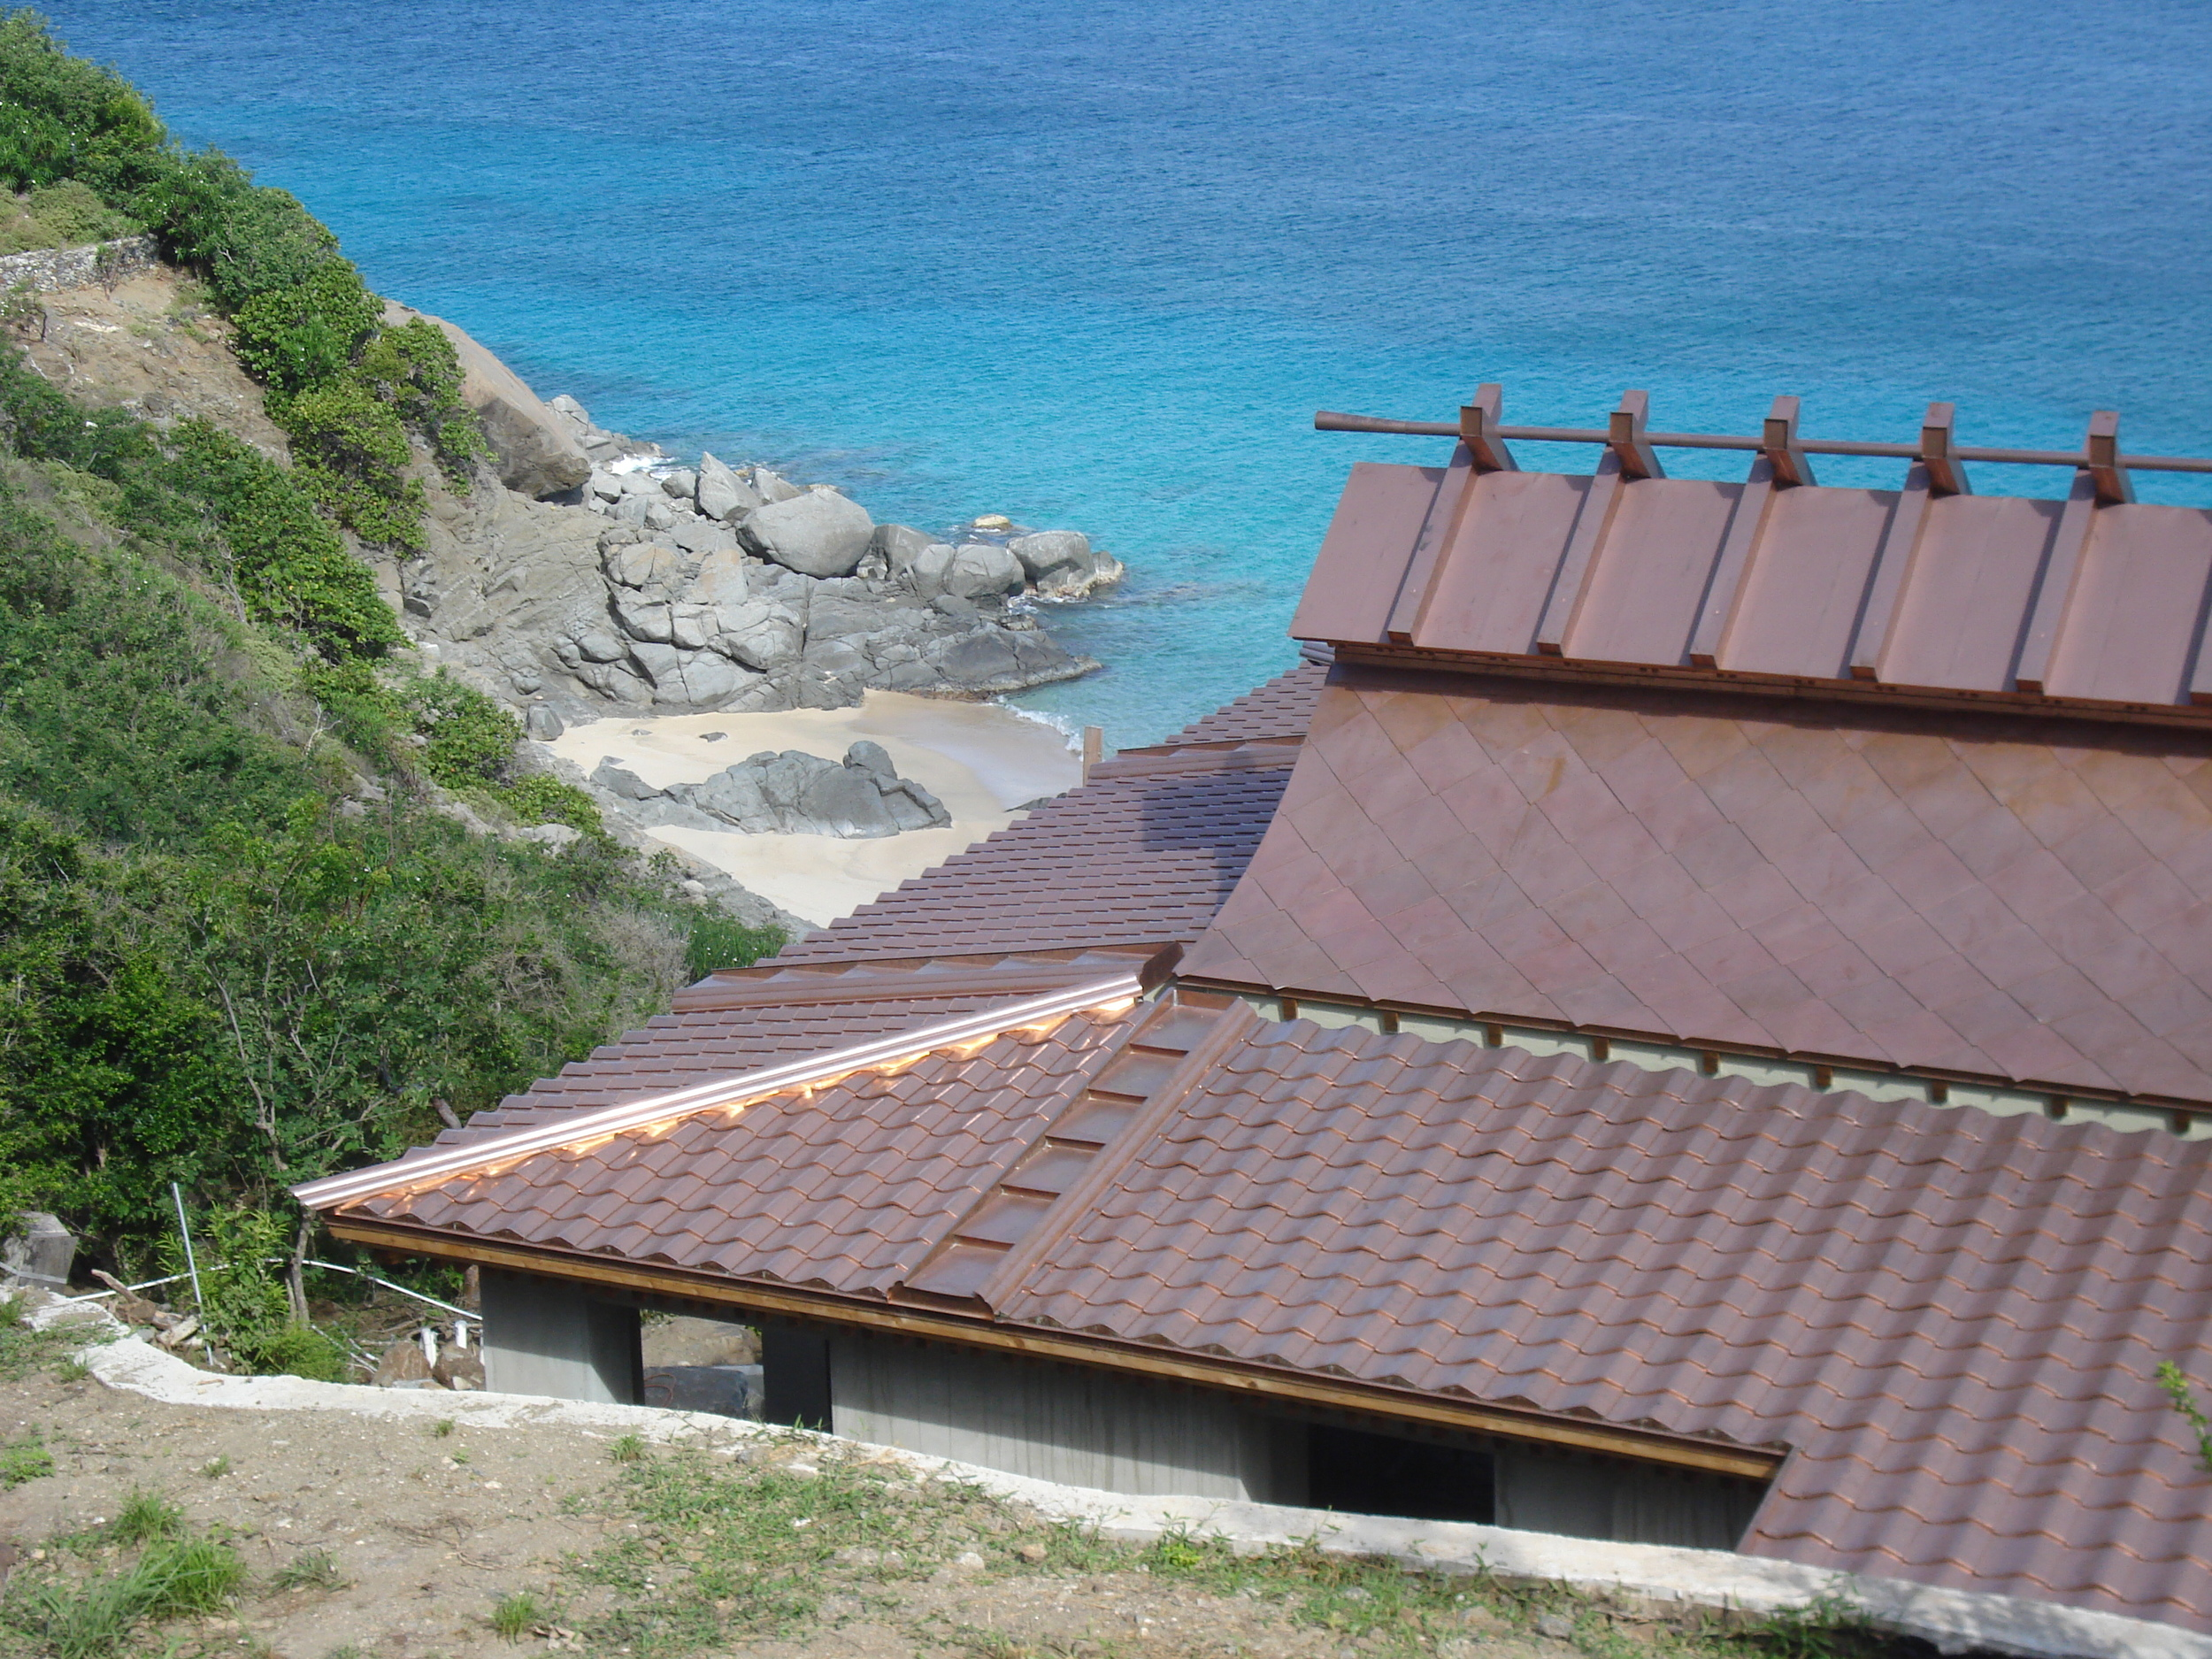 metal roof building by beach